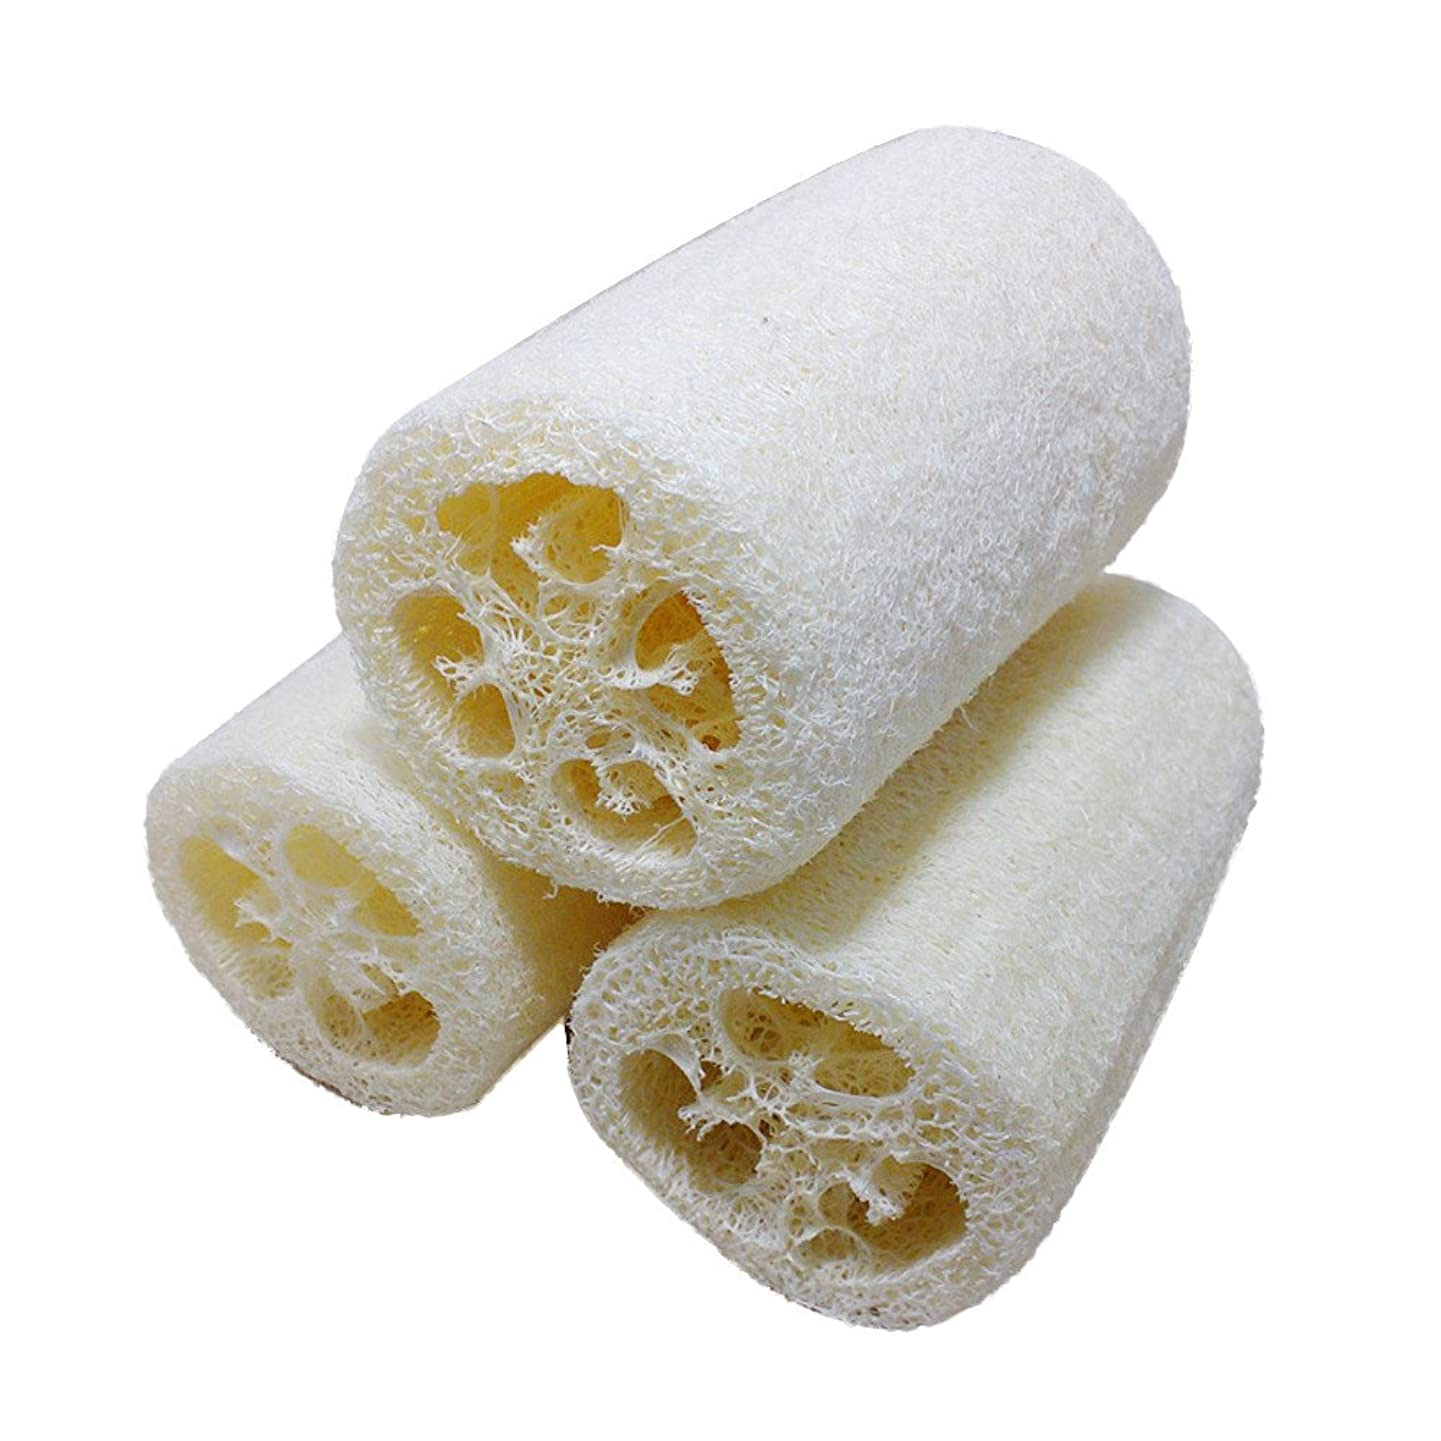 Sponge Scrubber,New Natural Loofah Bath Body Shower Sponge Scrubber Pad Hot,NszzJixo9